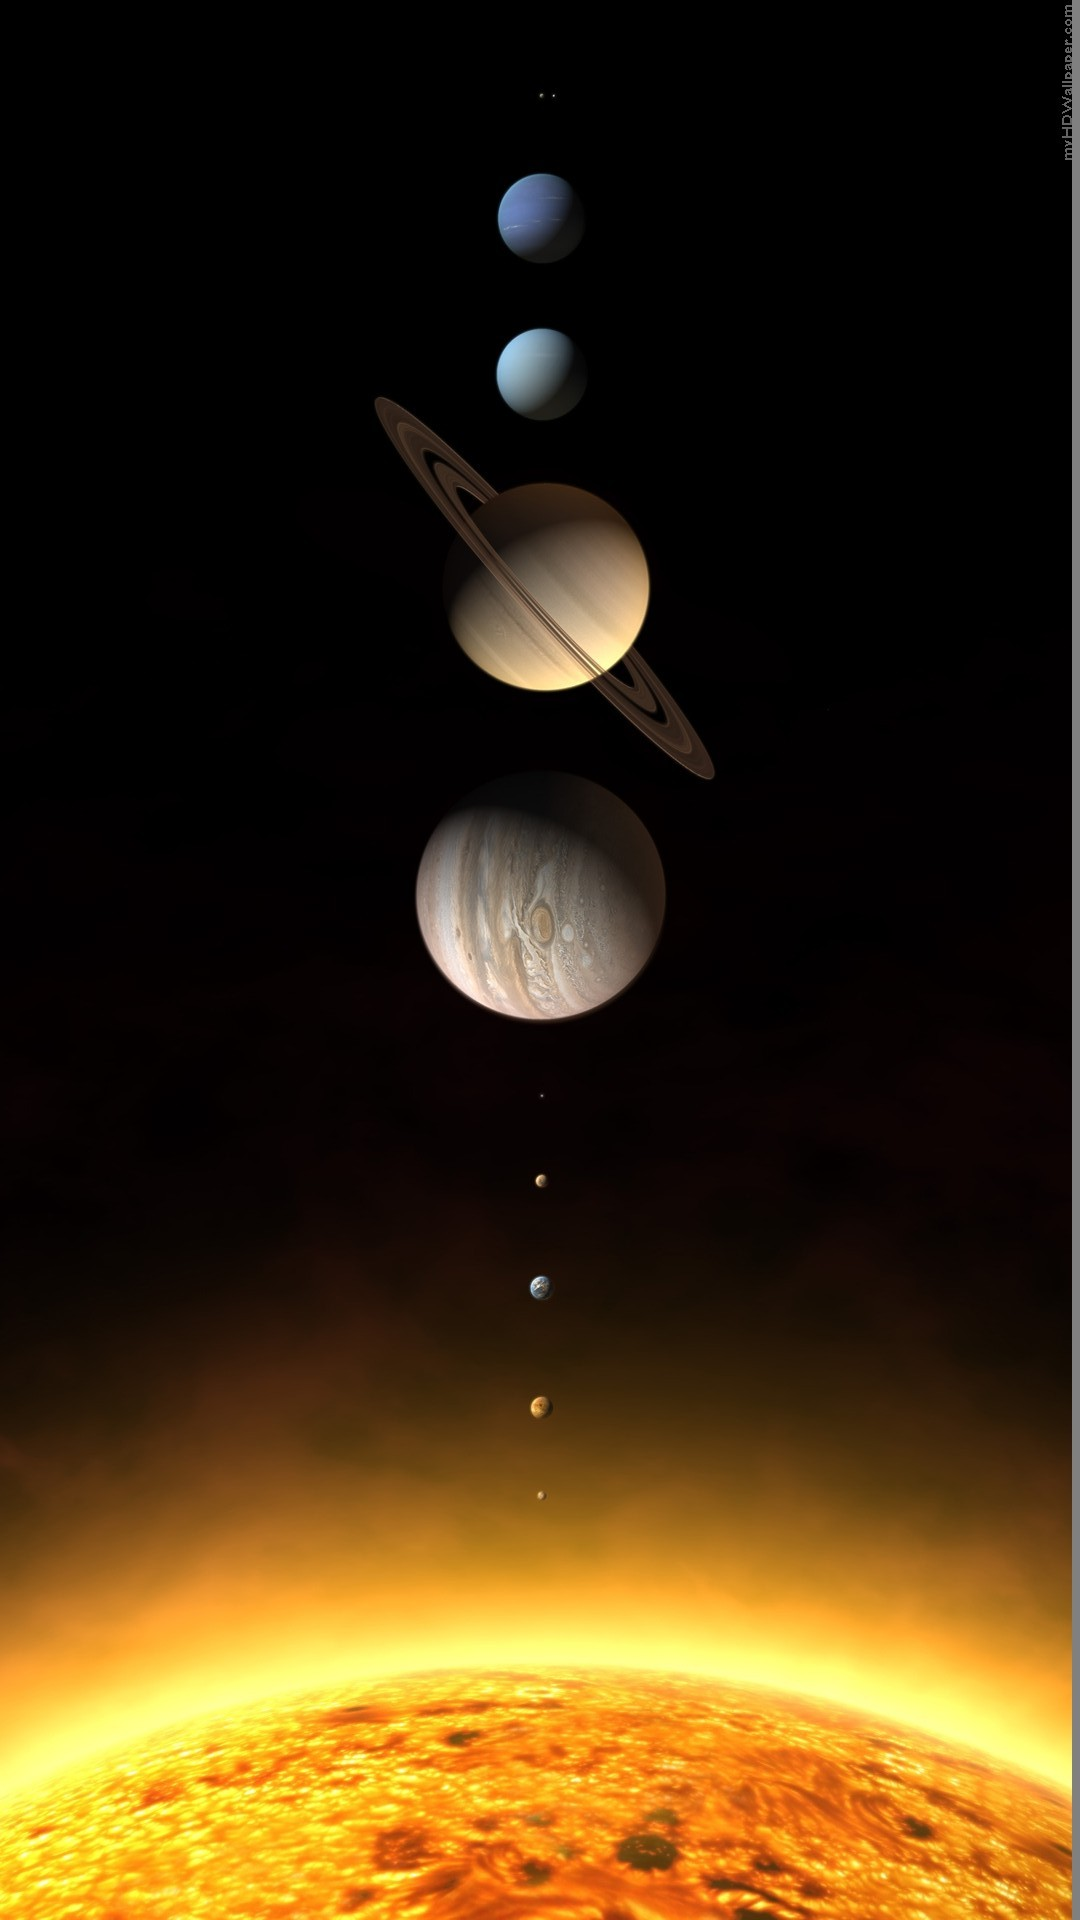 solar system iphone wallpaper - photo #6